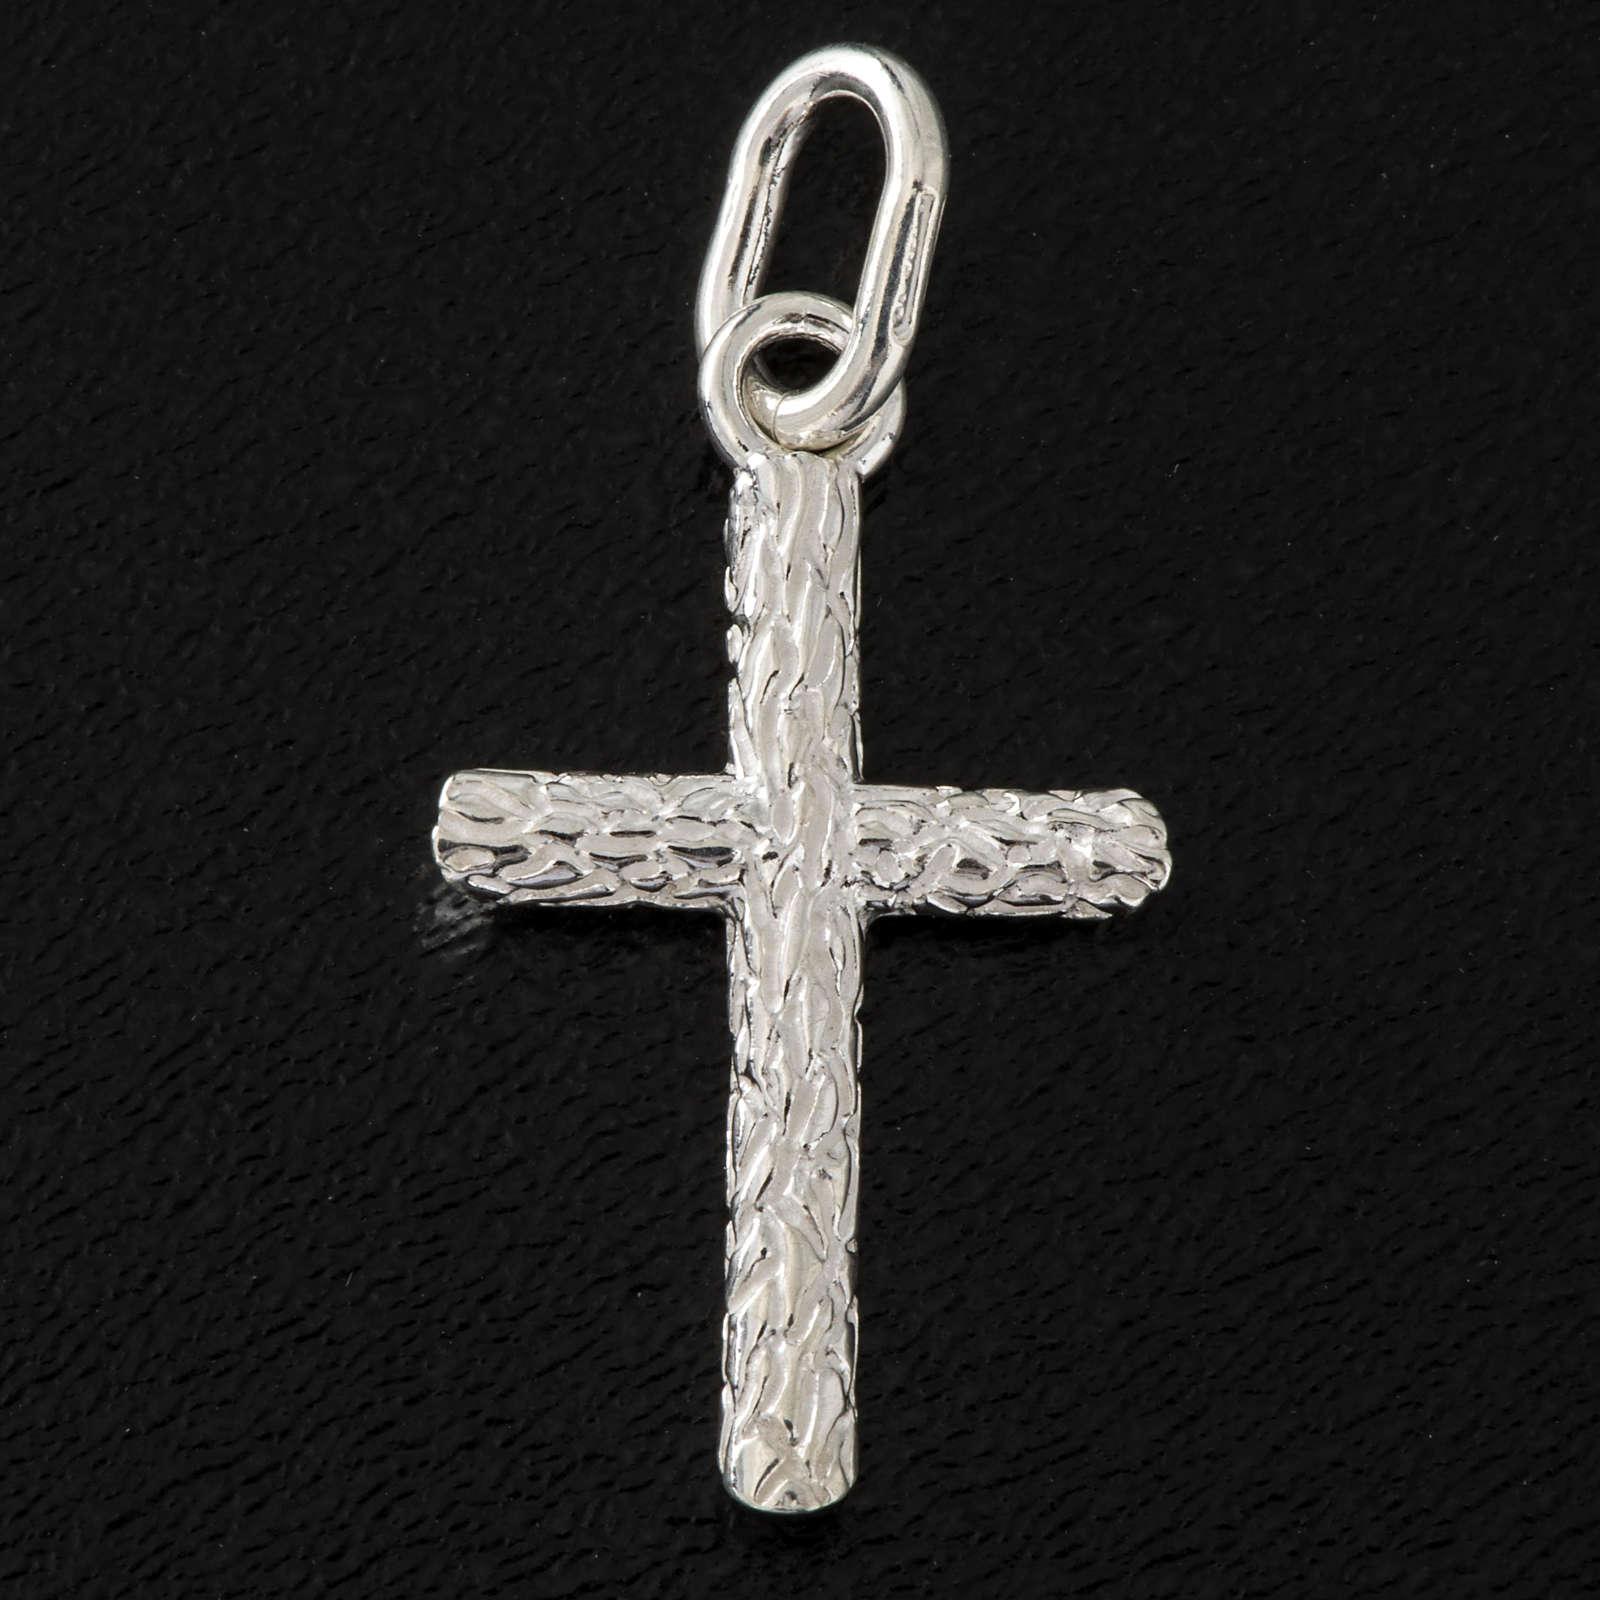 Krzyżyk zdobiony srebro 925 cm 2.5 4